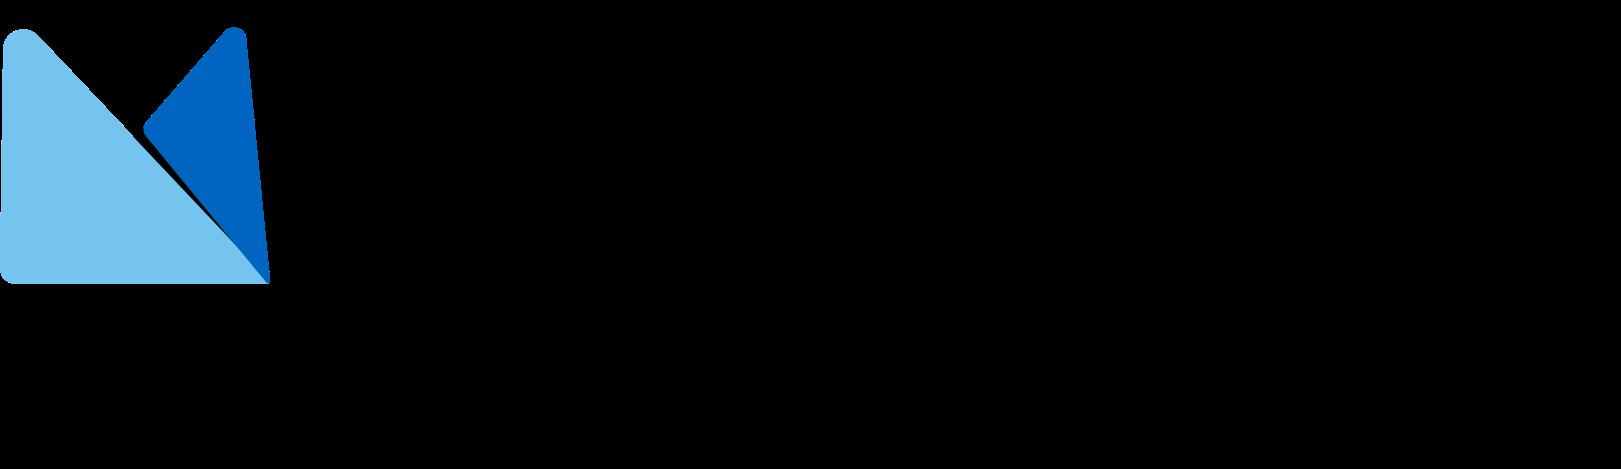 Duviter